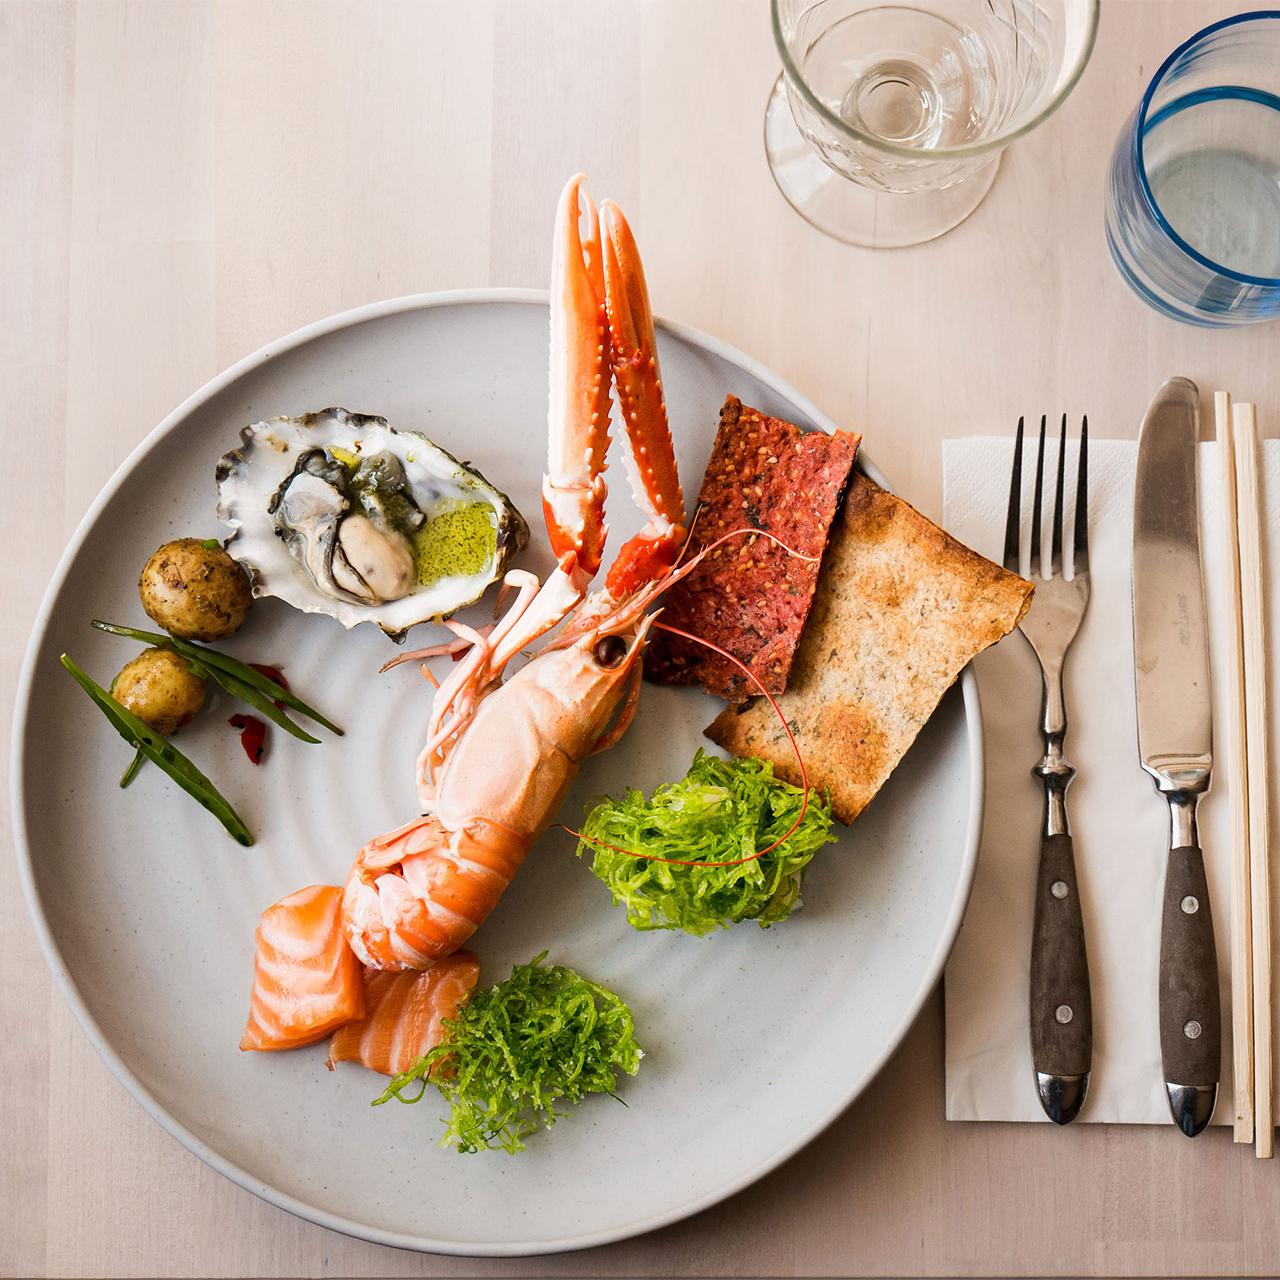 fresh seafood feast on Sweden's west coast